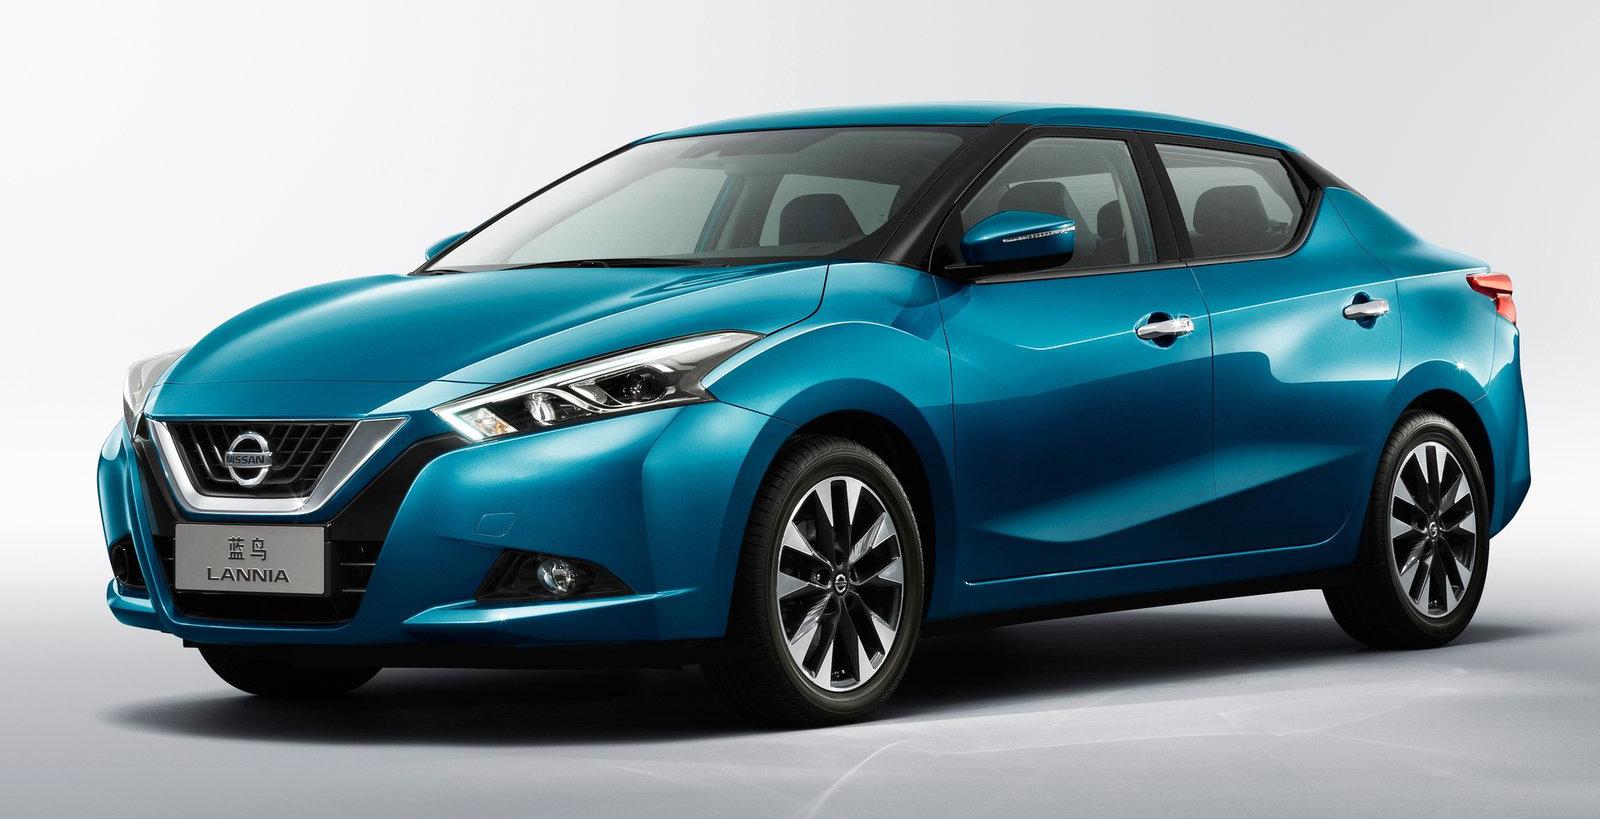 Nissan 2018 >> Shanghai 2015: Production Nissan Lannia for China Paul Tan - Image 330340